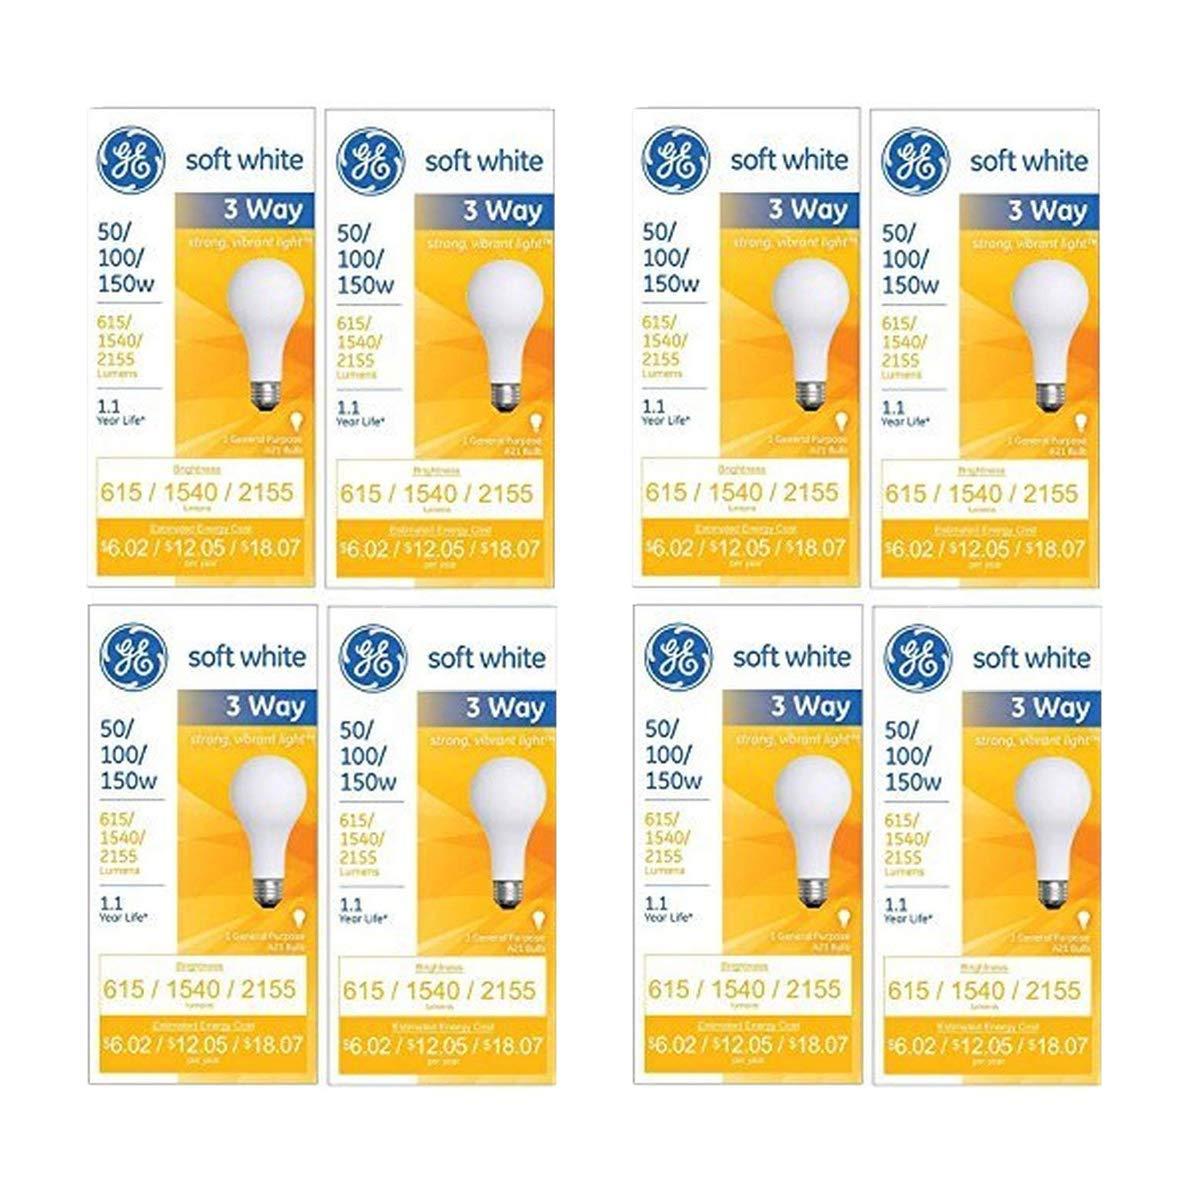 97494 Lighting 50/100/150-Watt, 3-Way Light Bulb, Soft White, 8-Pack